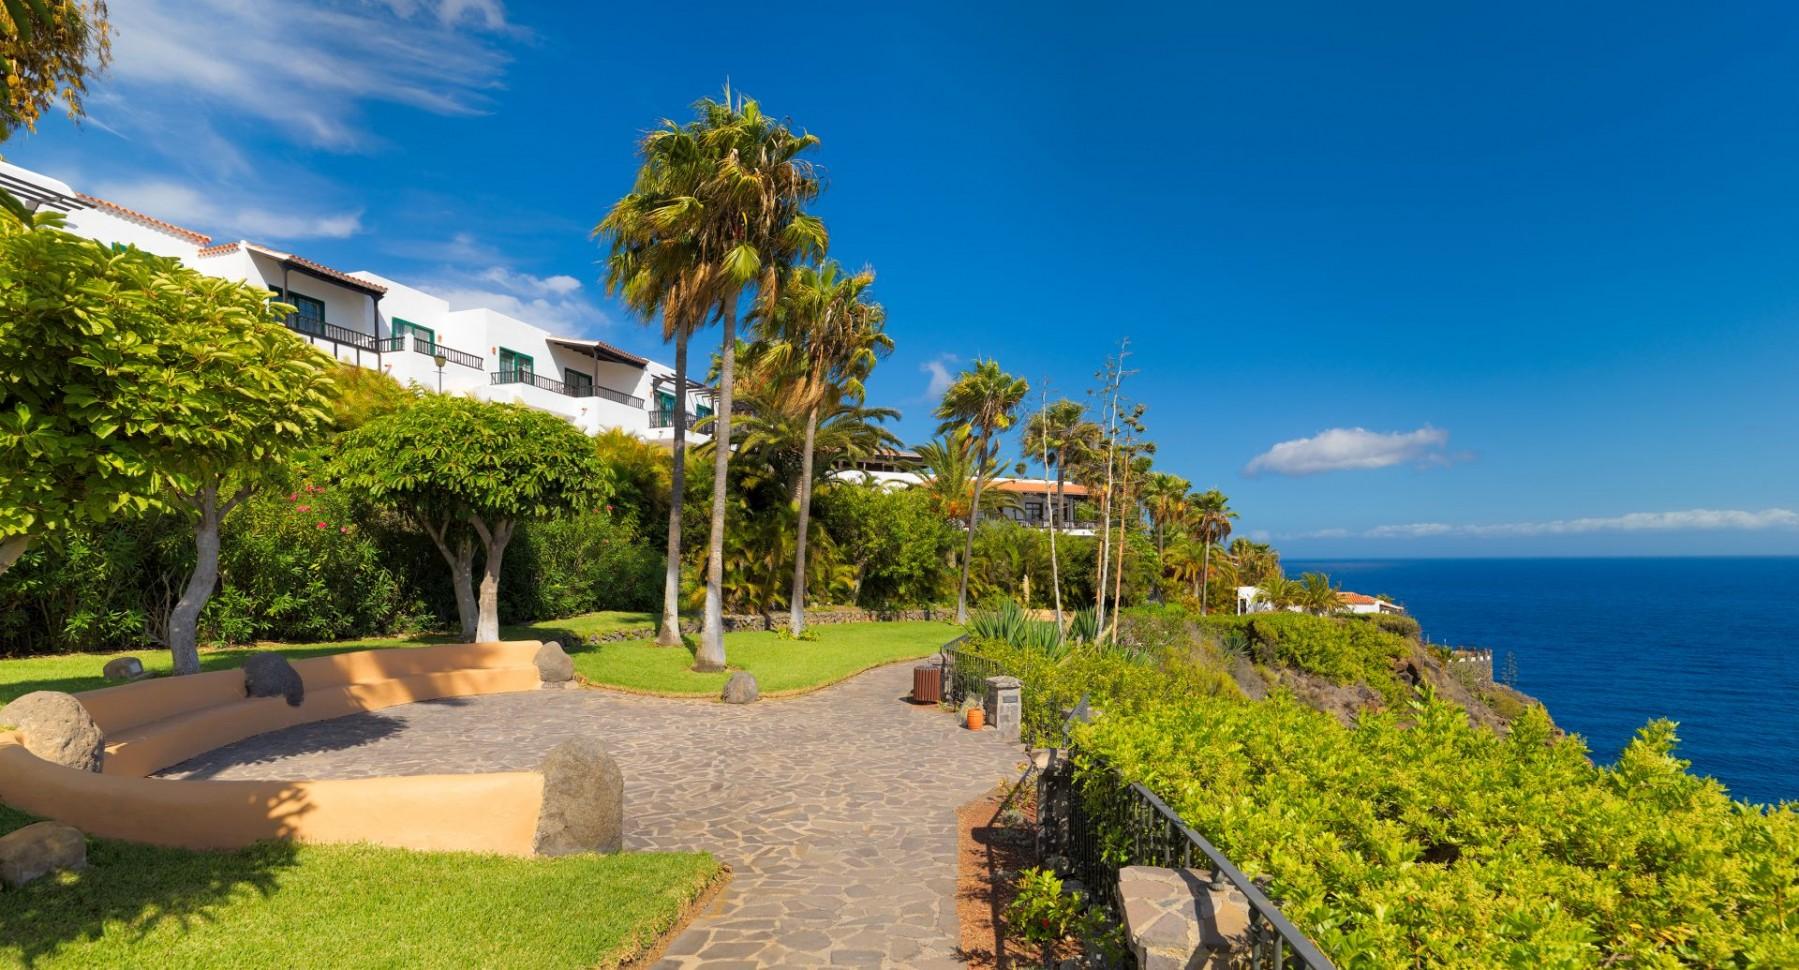 Jardin tecina for La gomera hotel jardin tecina